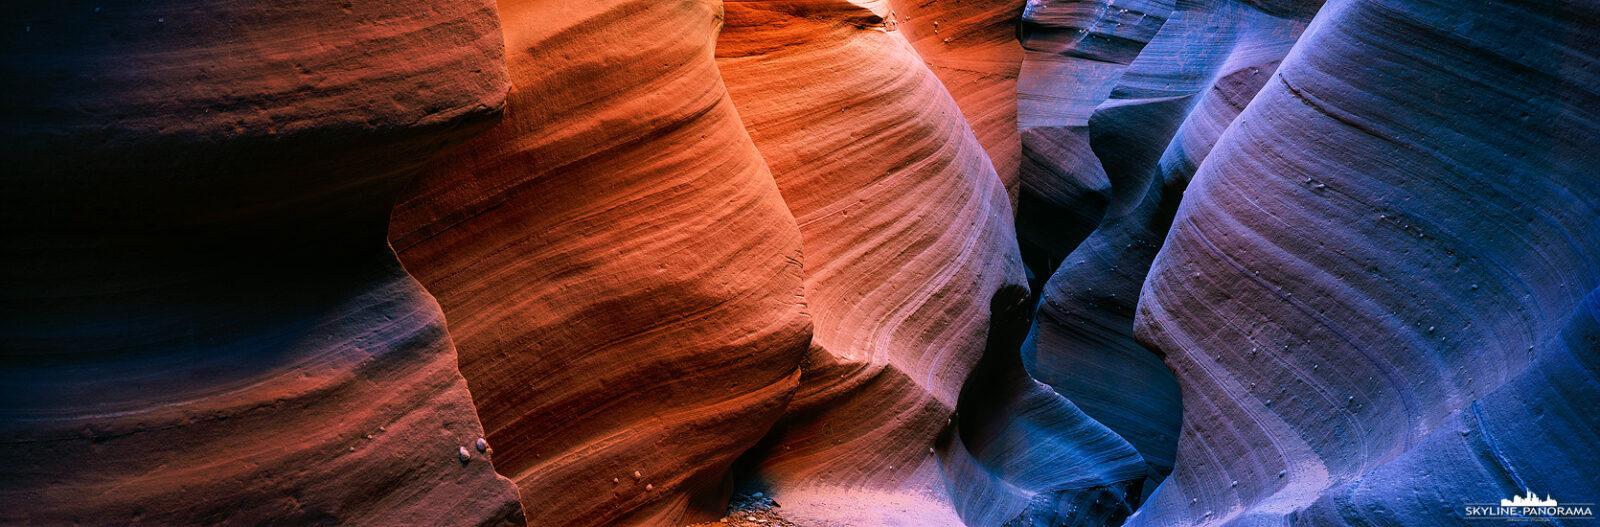 Slot Canyon in Page Arizona - (p_01198)